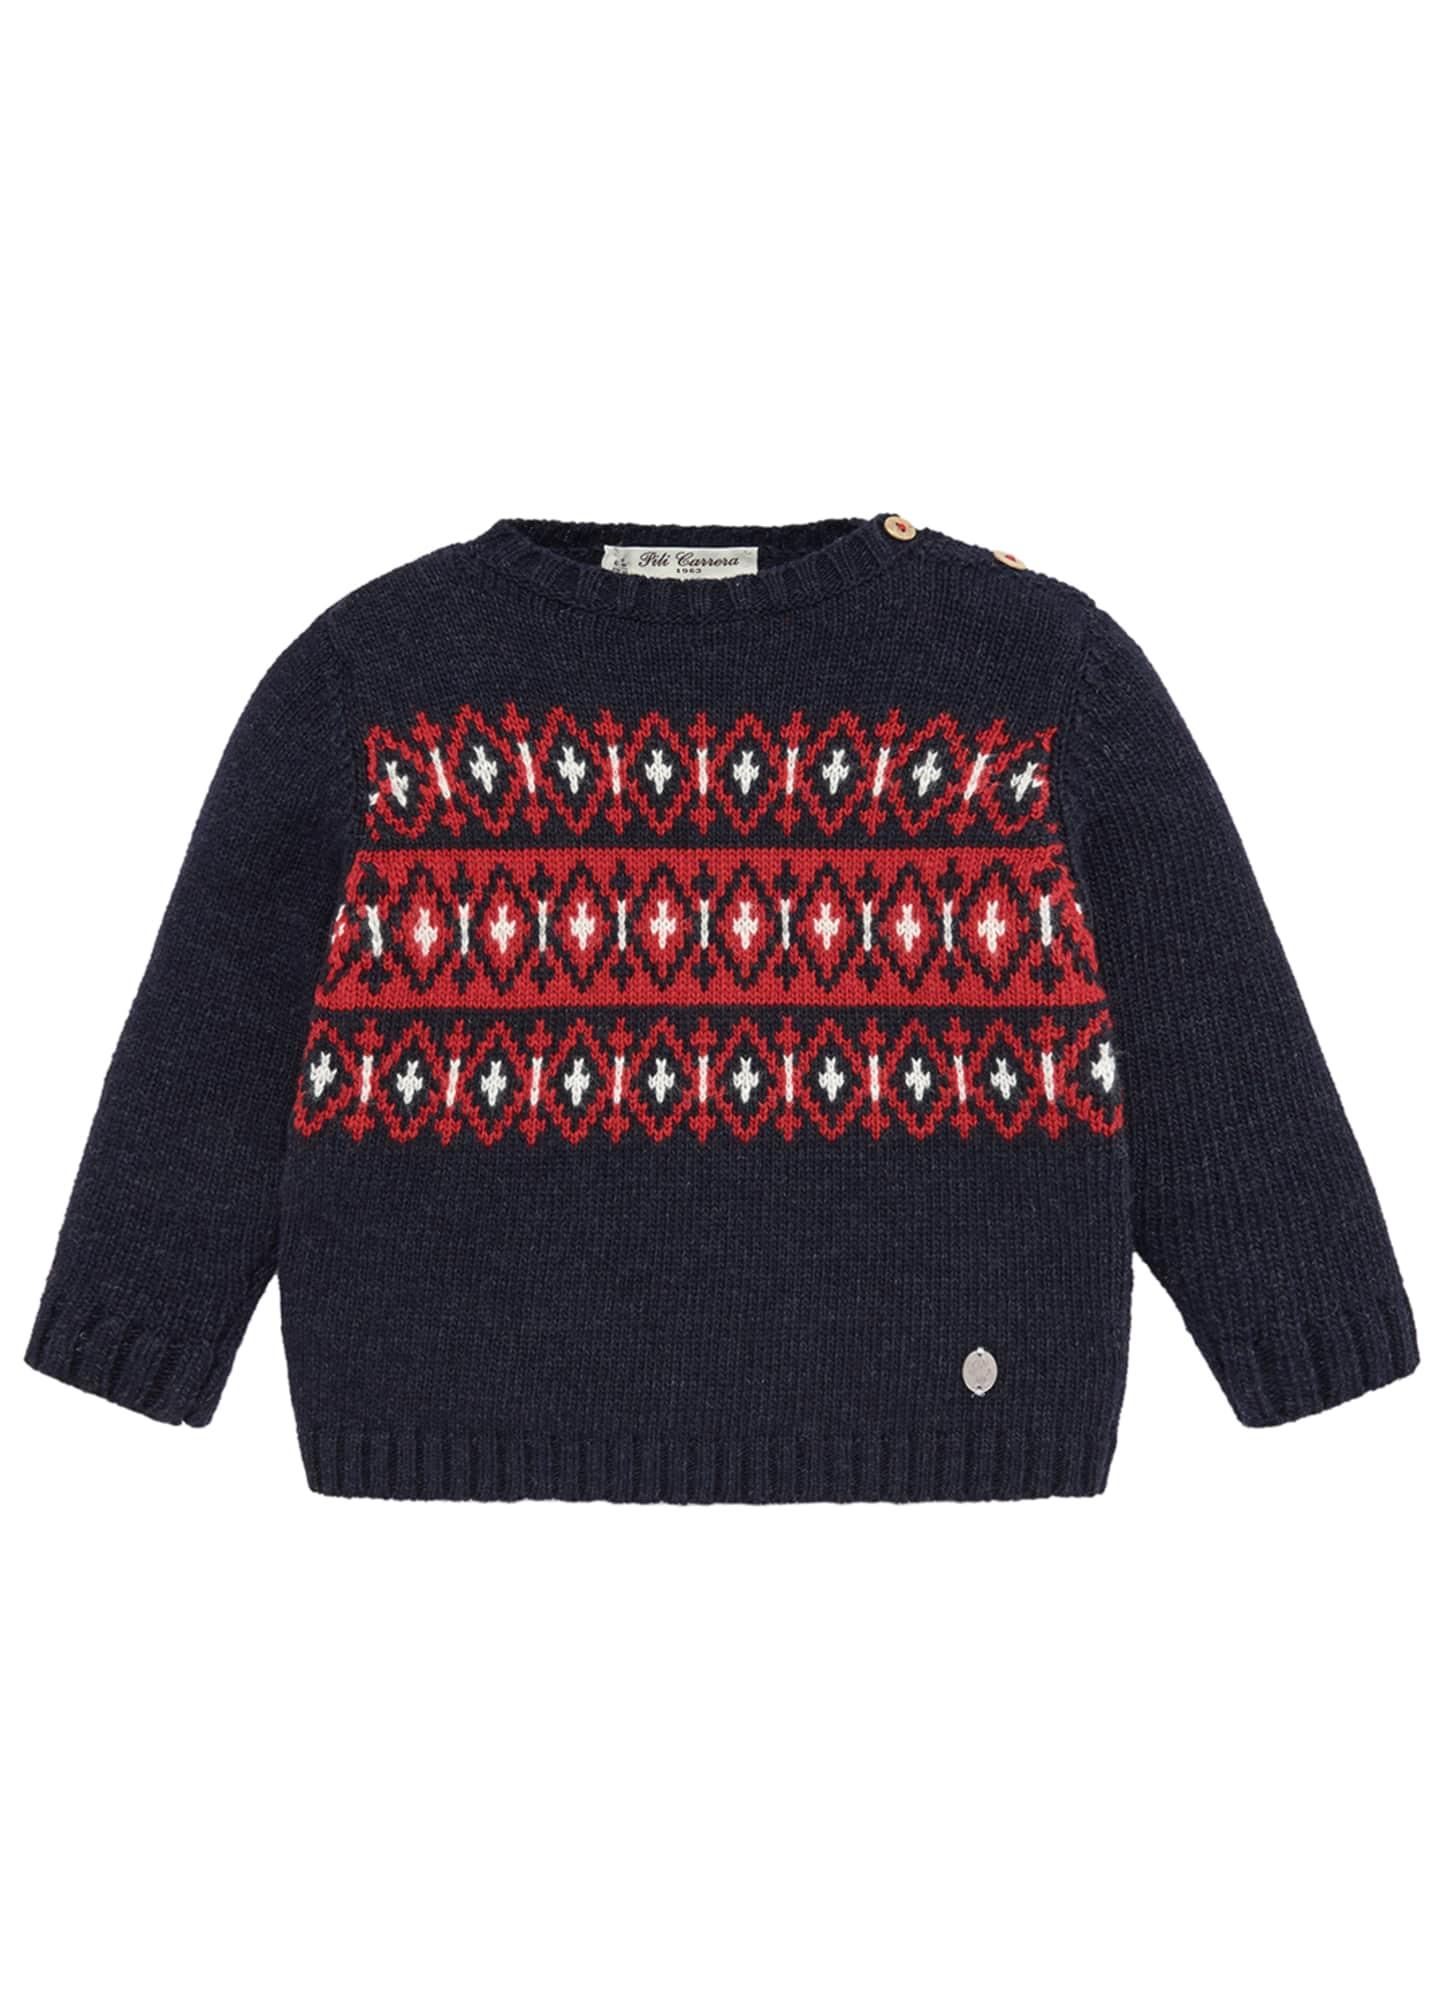 Pili Carrera Fair Isle Knit Sweater, Size 2-4